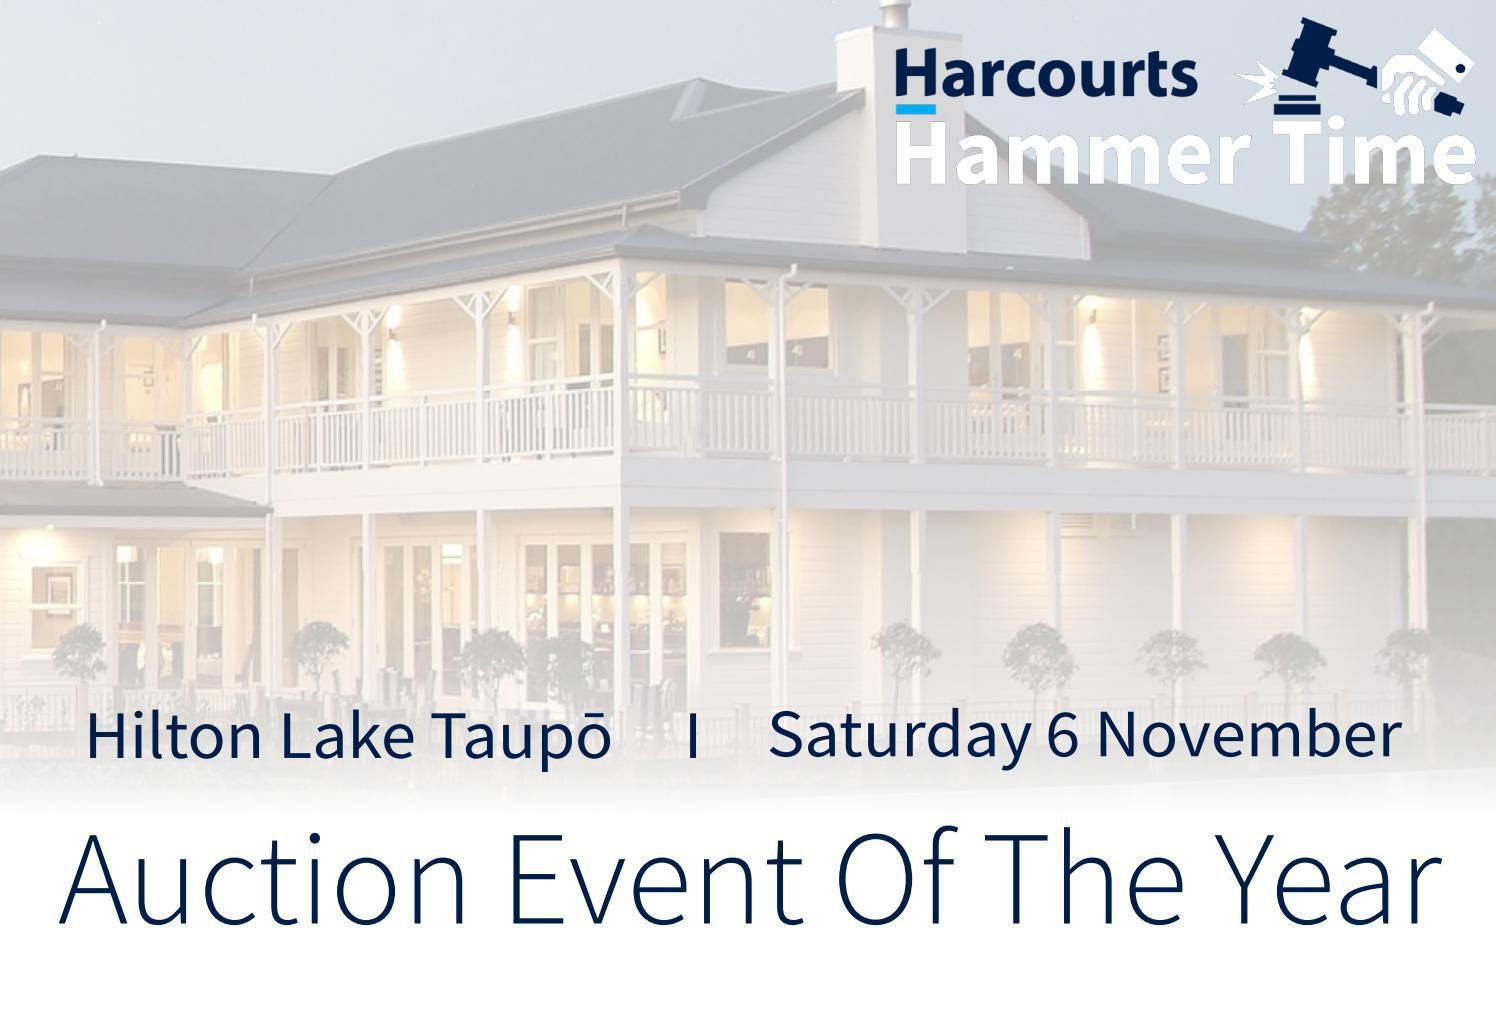 Harcourts Hammer Time Property Magazine November 6, 2021